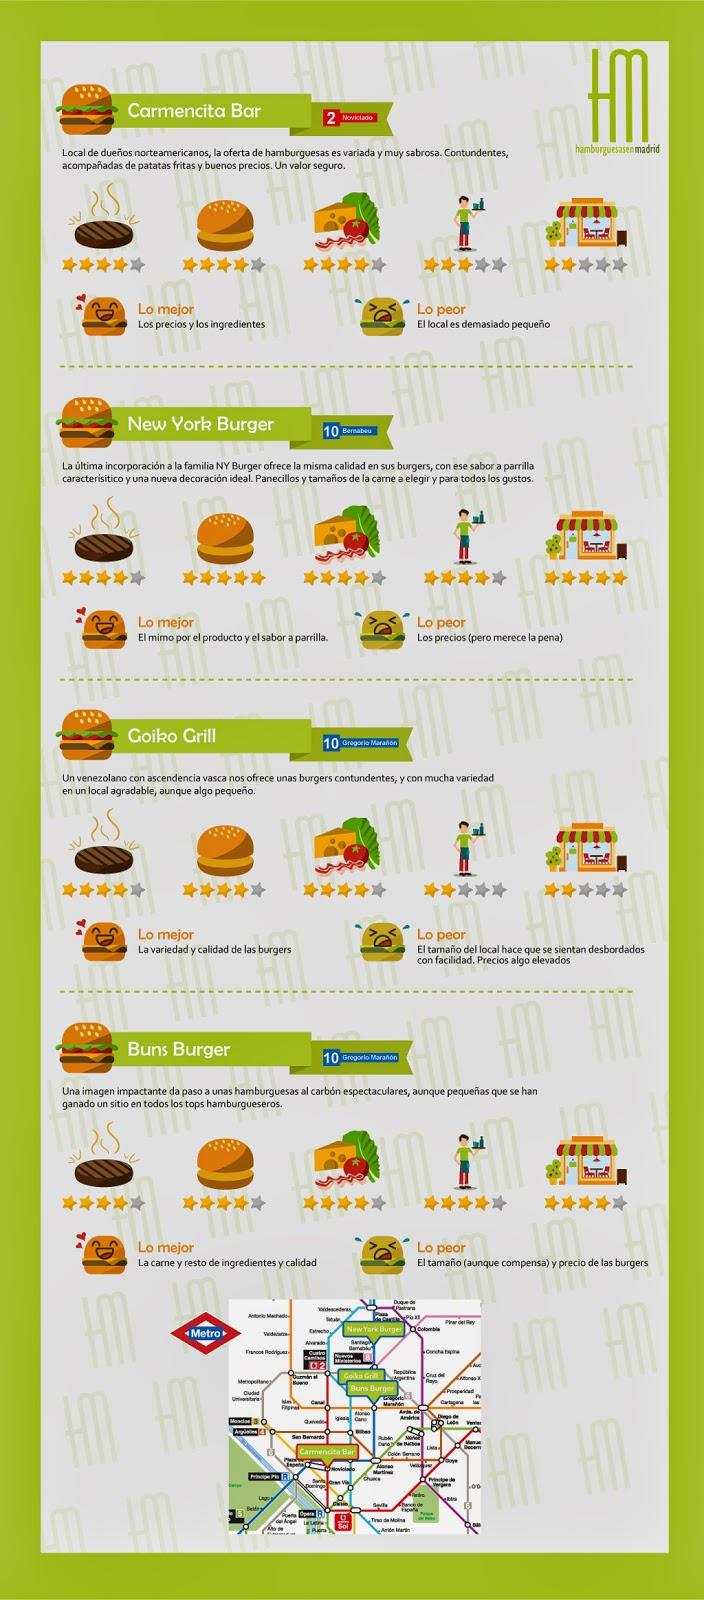 Infografia Metro a Metro hamburguesero